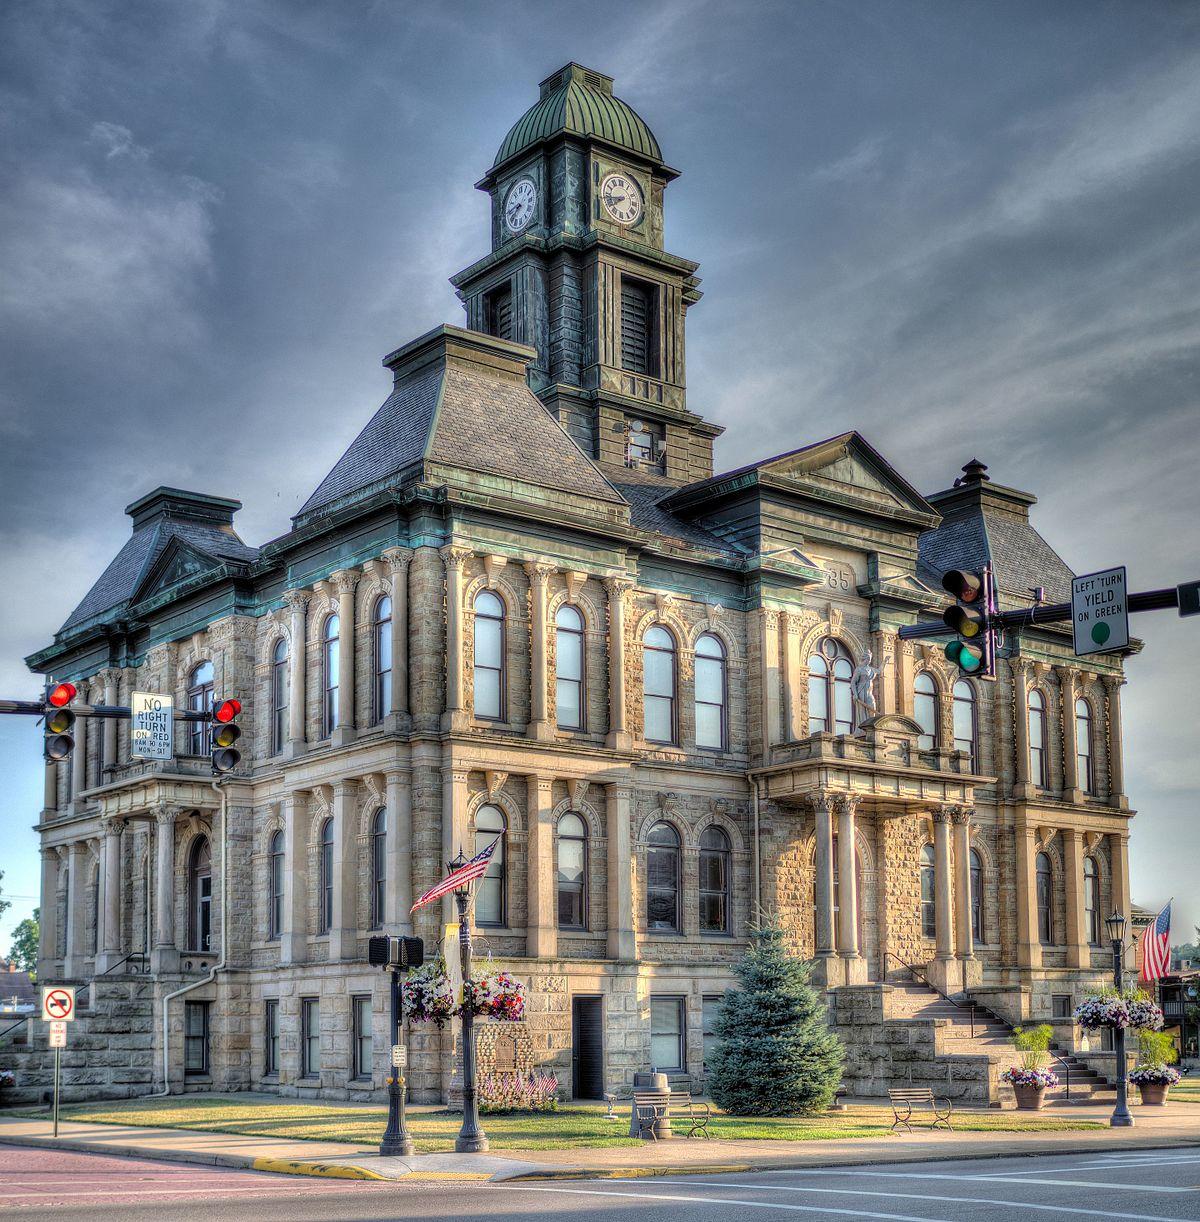 Ohio holmes county nashville - Ohio Holmes County Nashville 9